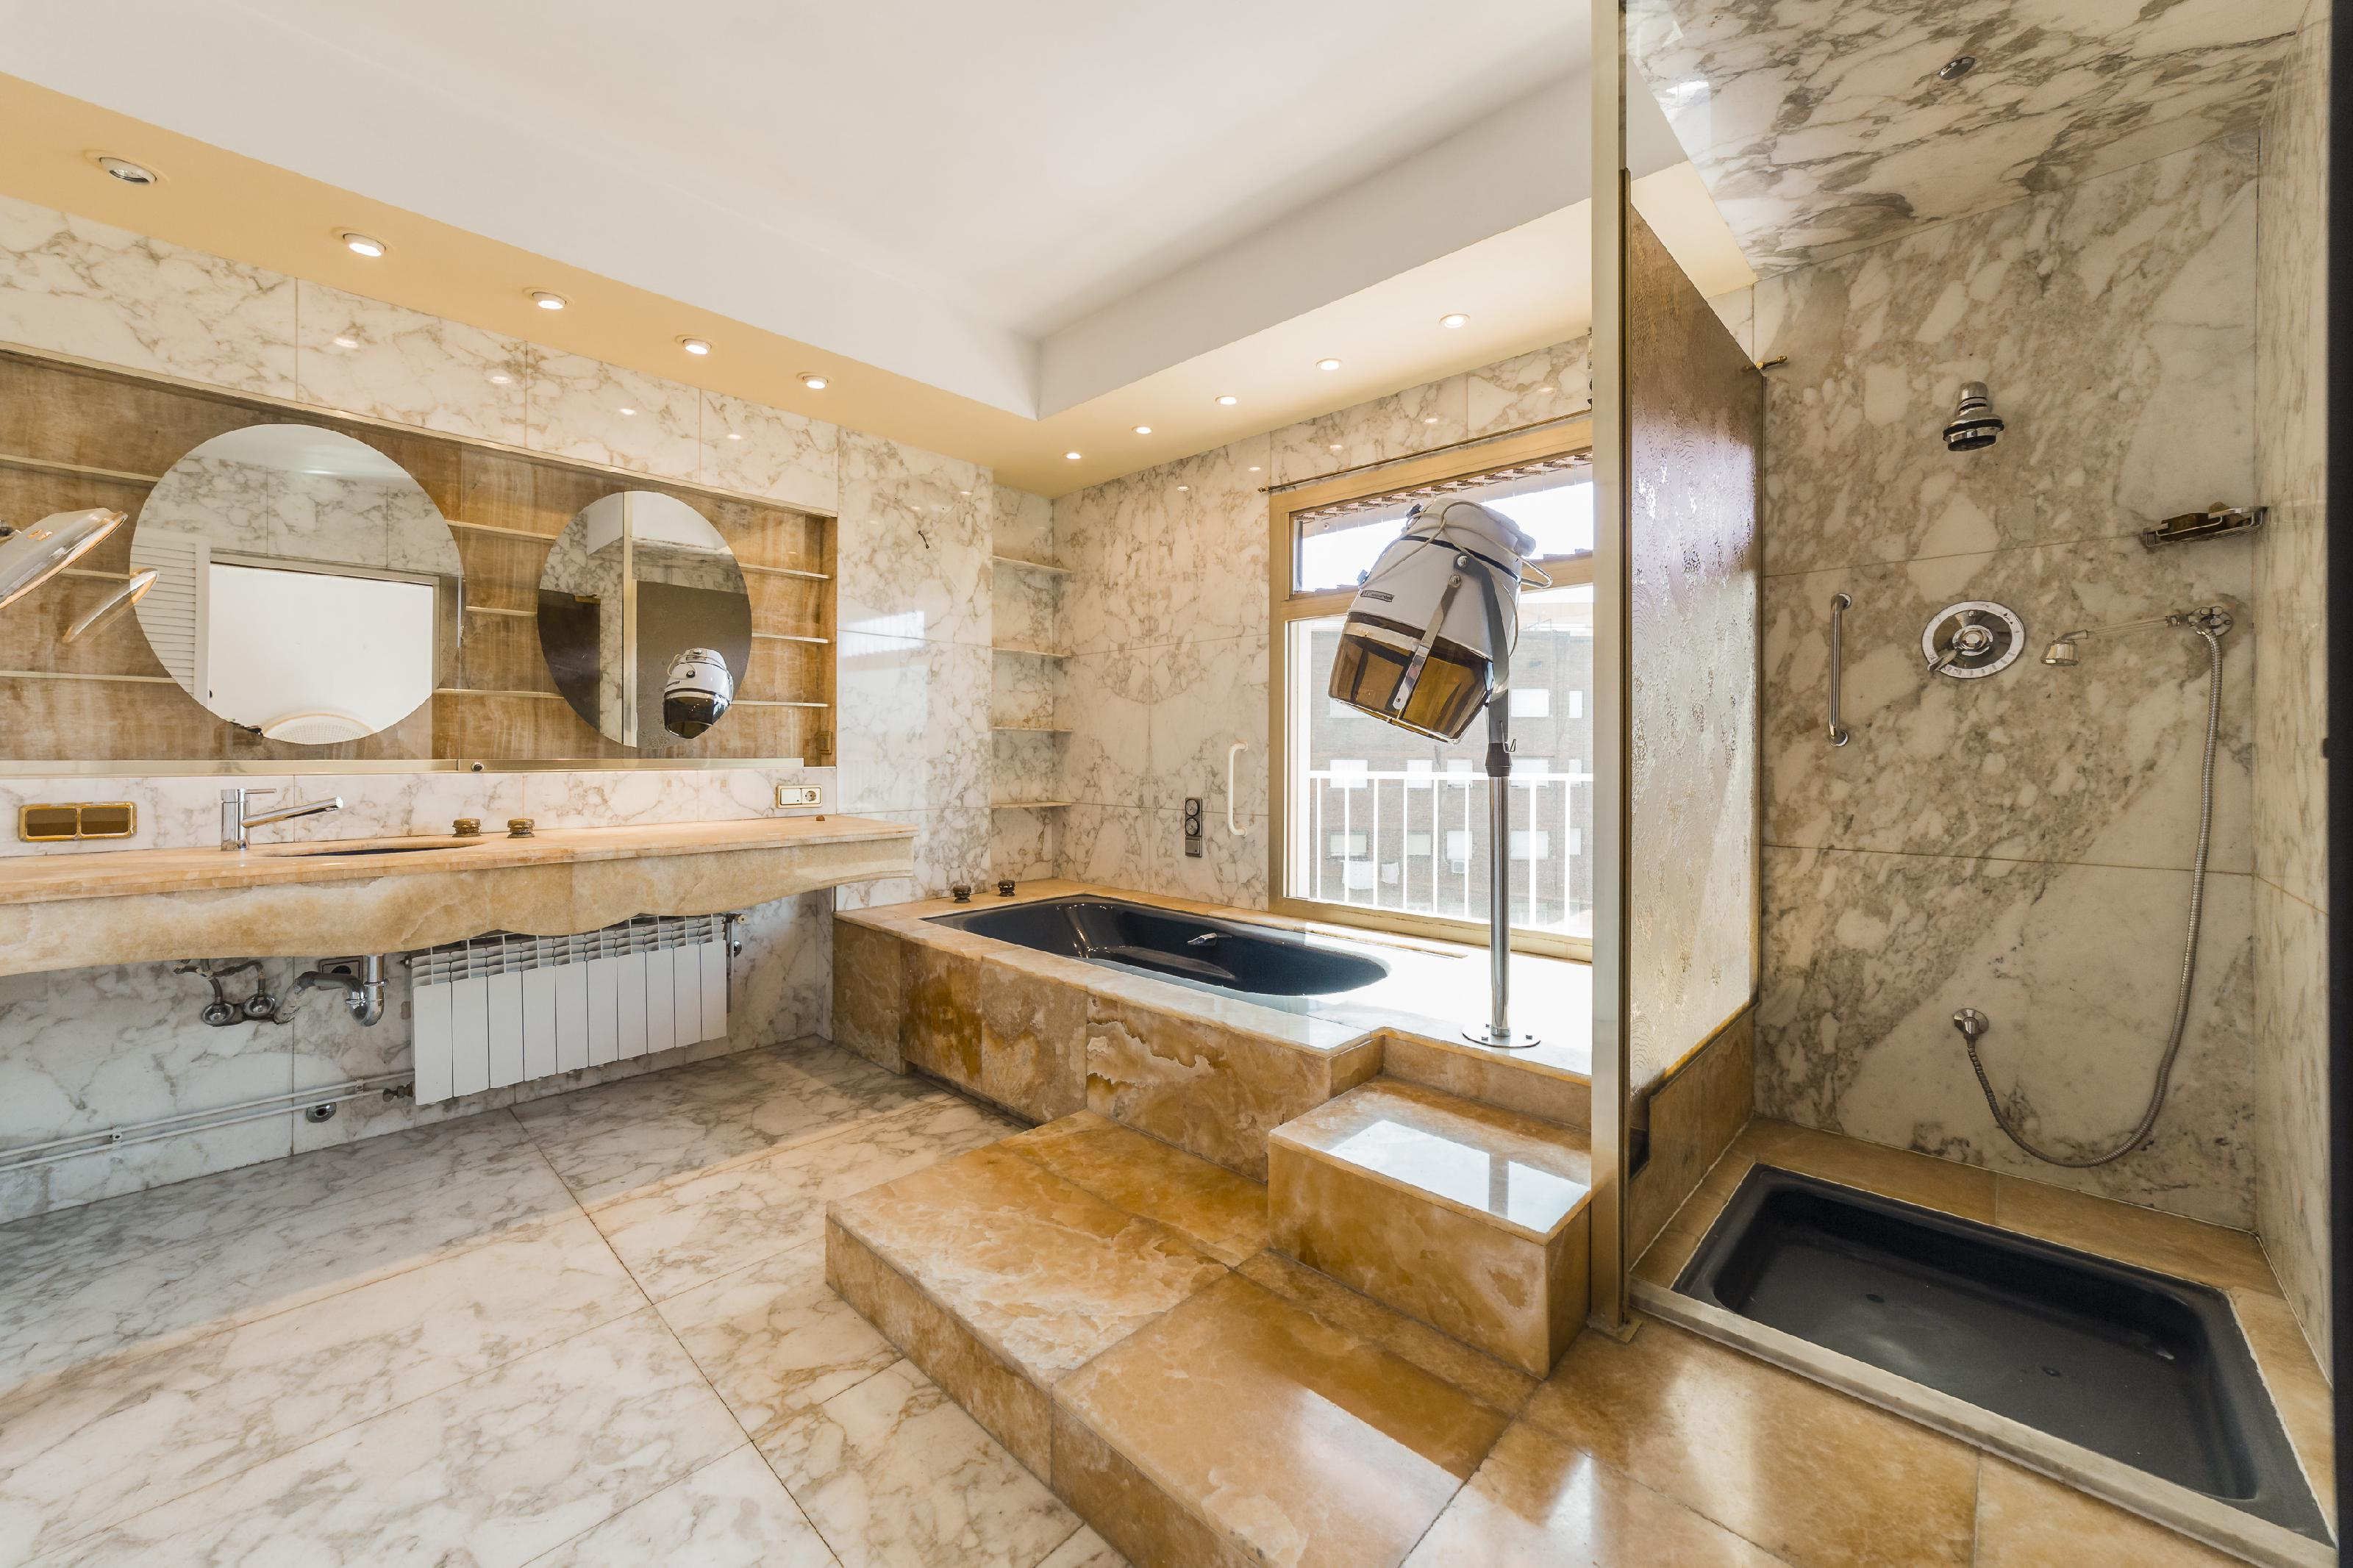 249314 Penthouse for sale in Sarrià-Sant Gervasi, Sant Gervasi-Galvany 6